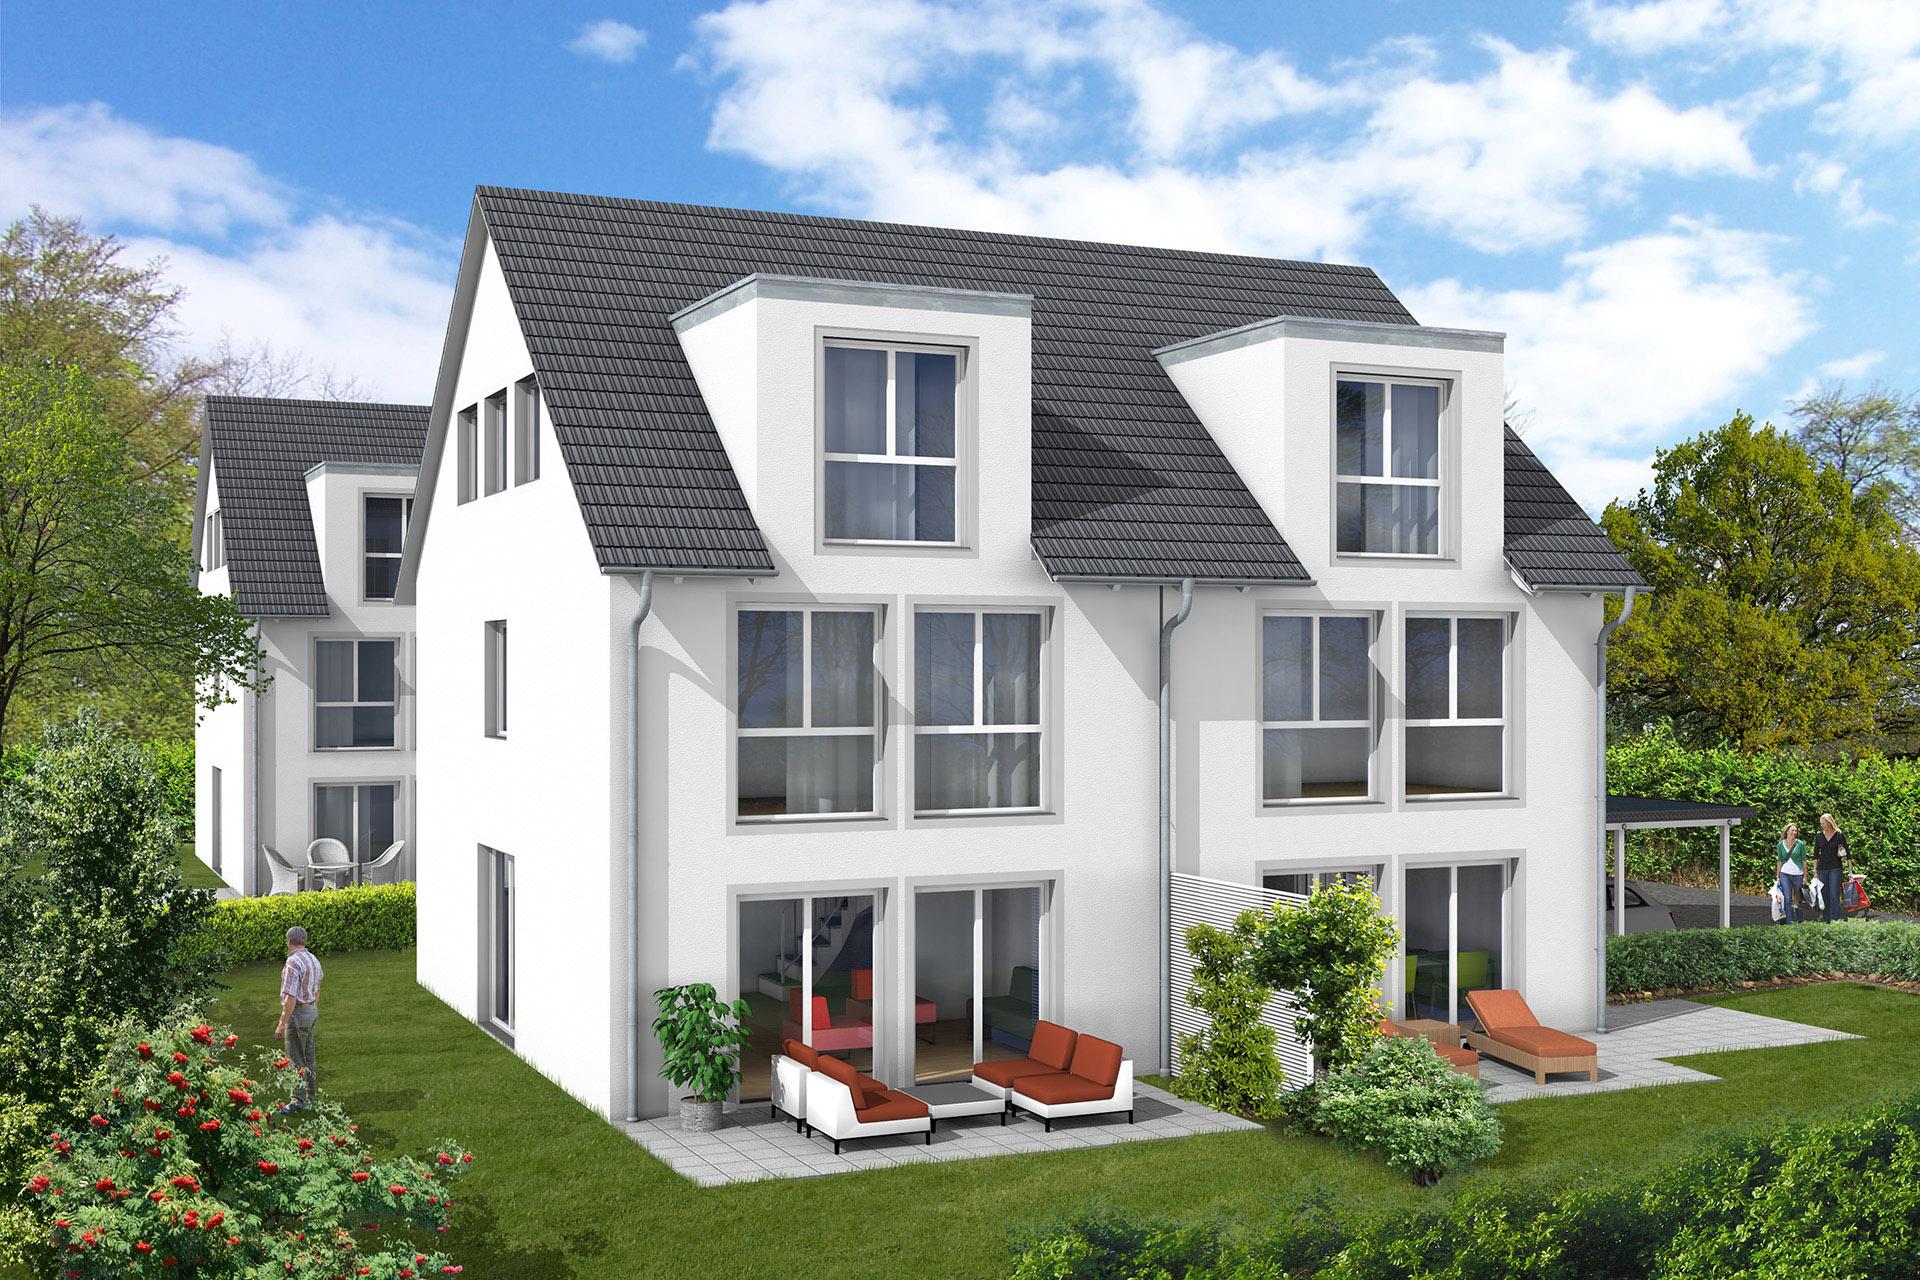 Projekte - Wohnbau MZ - infamilienhäuser, Doppelhäuser ... size: 1920 x 1280 post ID: 9 File size: 0 B